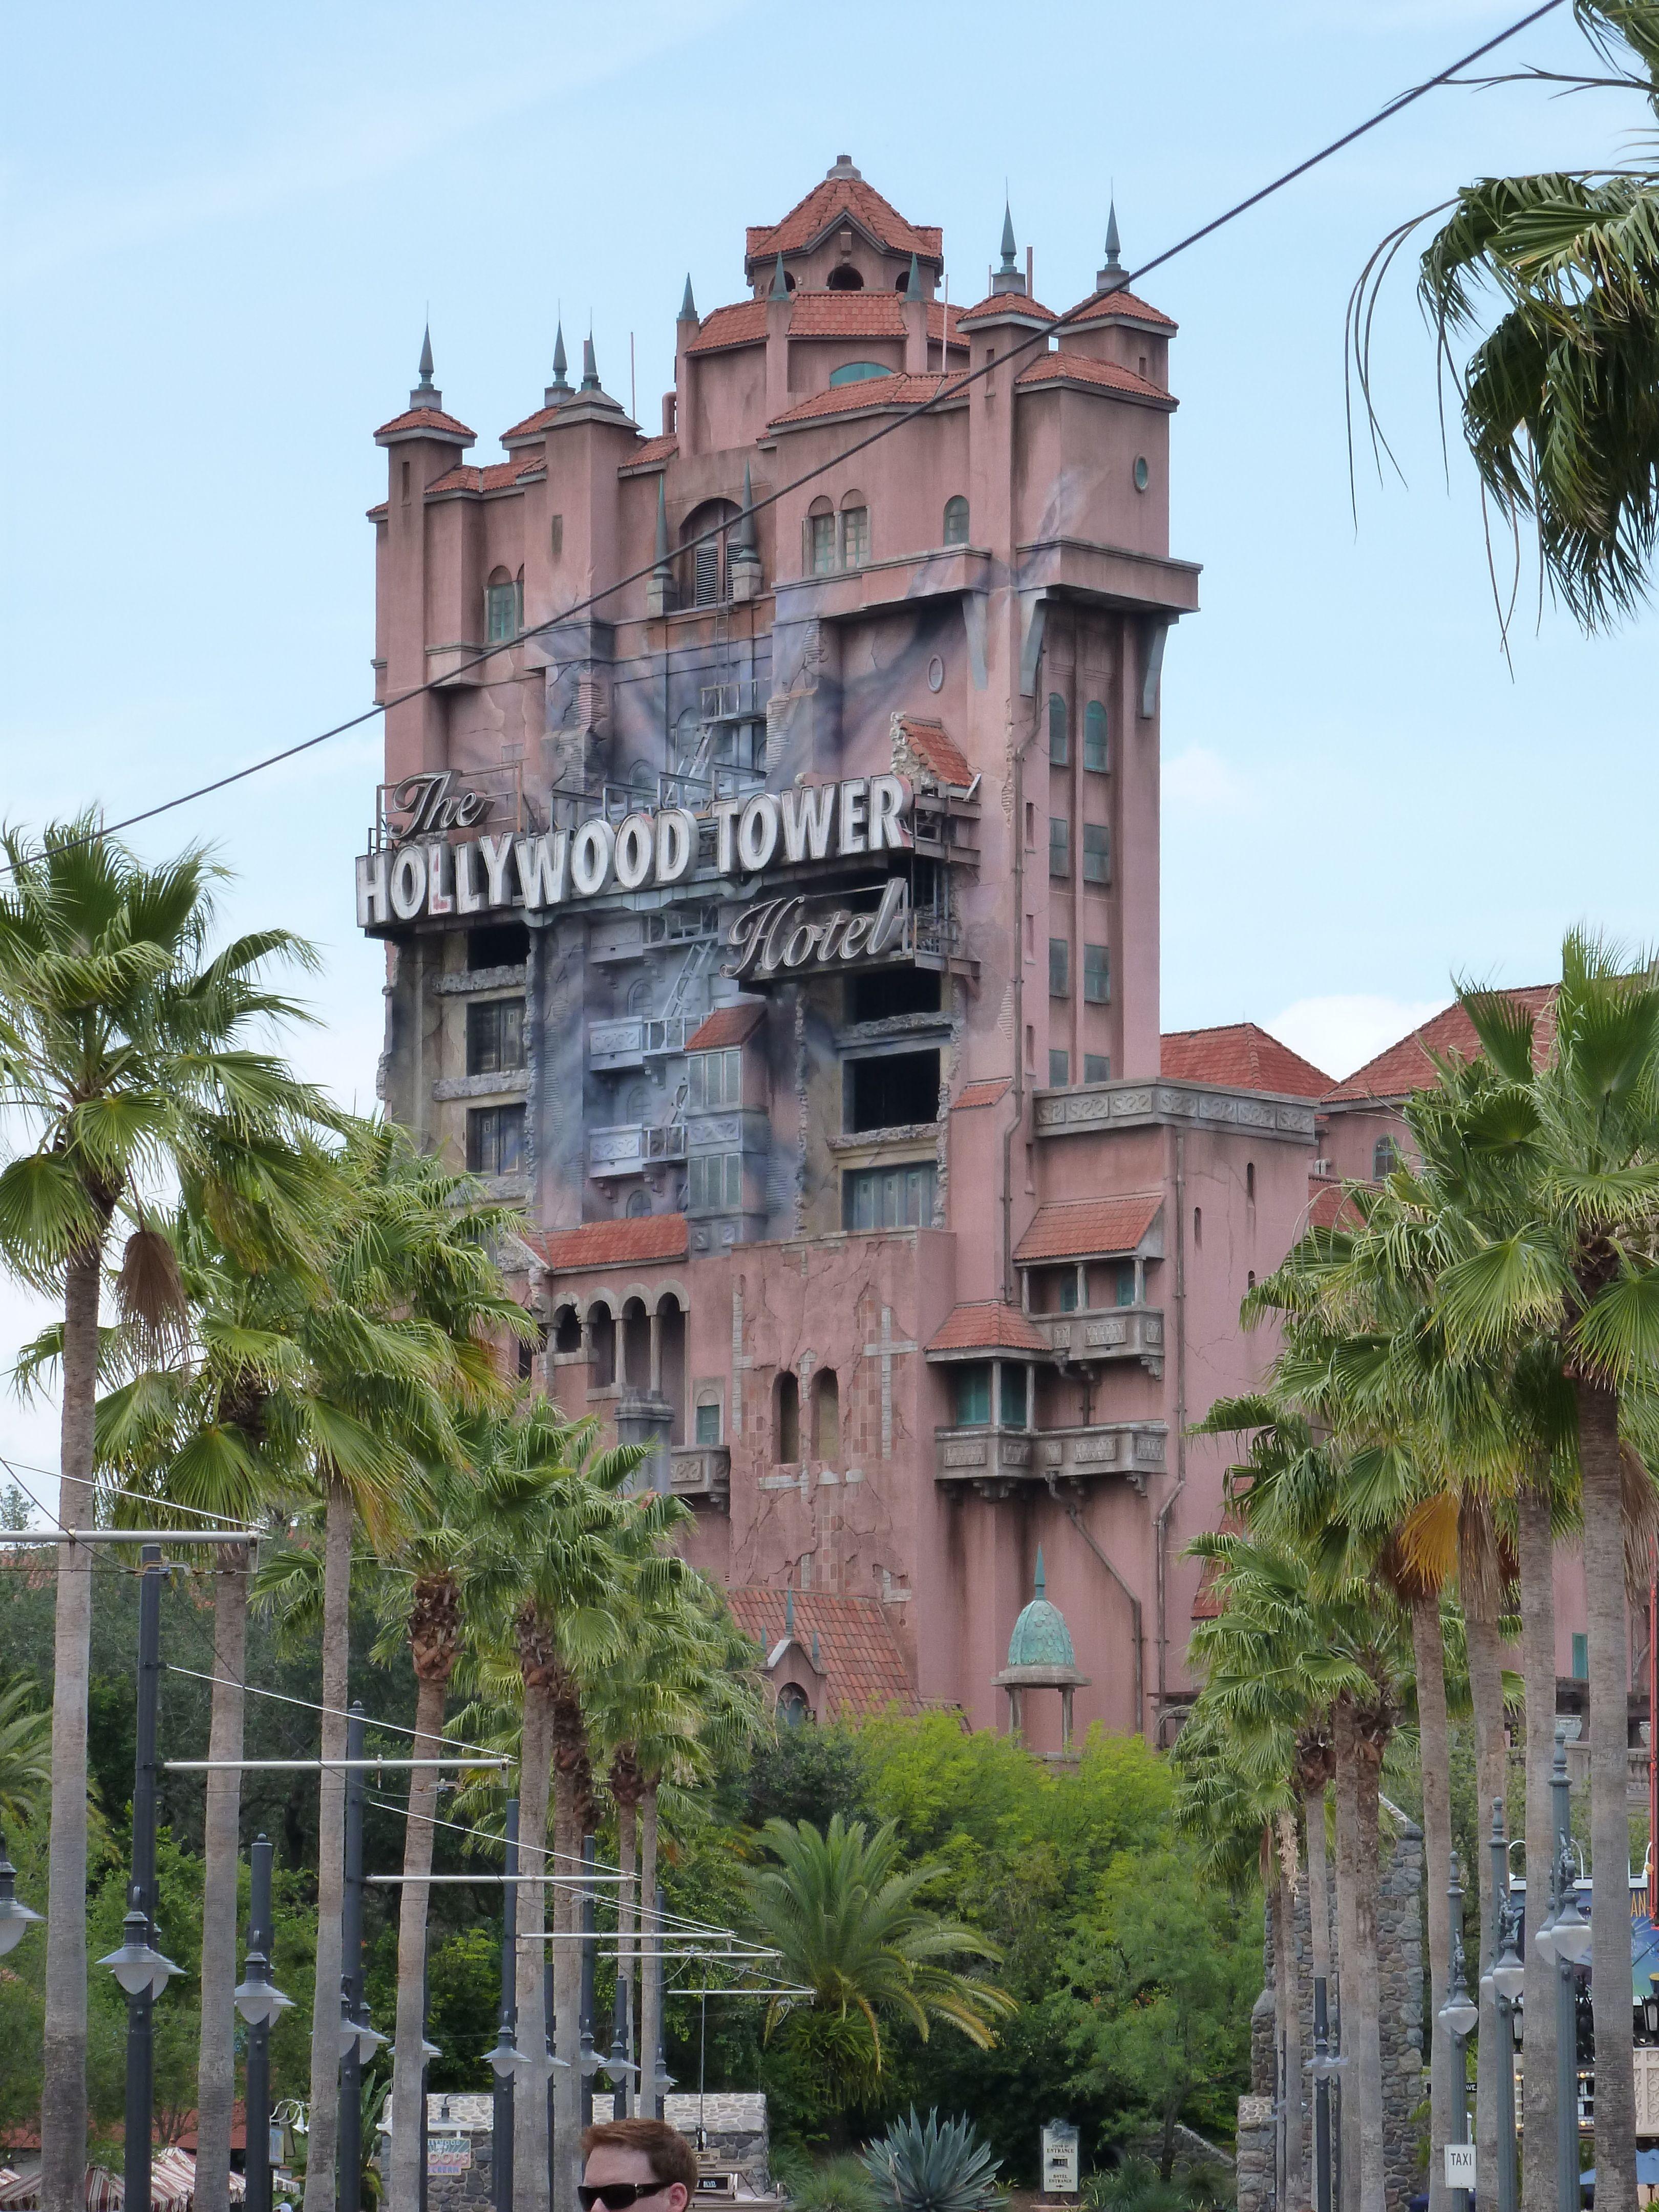 Tower Of Terror Thrill Ride At Disney World Hollywood Studios In Orlando Fl Family Vacation Disney World Hollywood Studios Rides At Disney Tower Of Terror